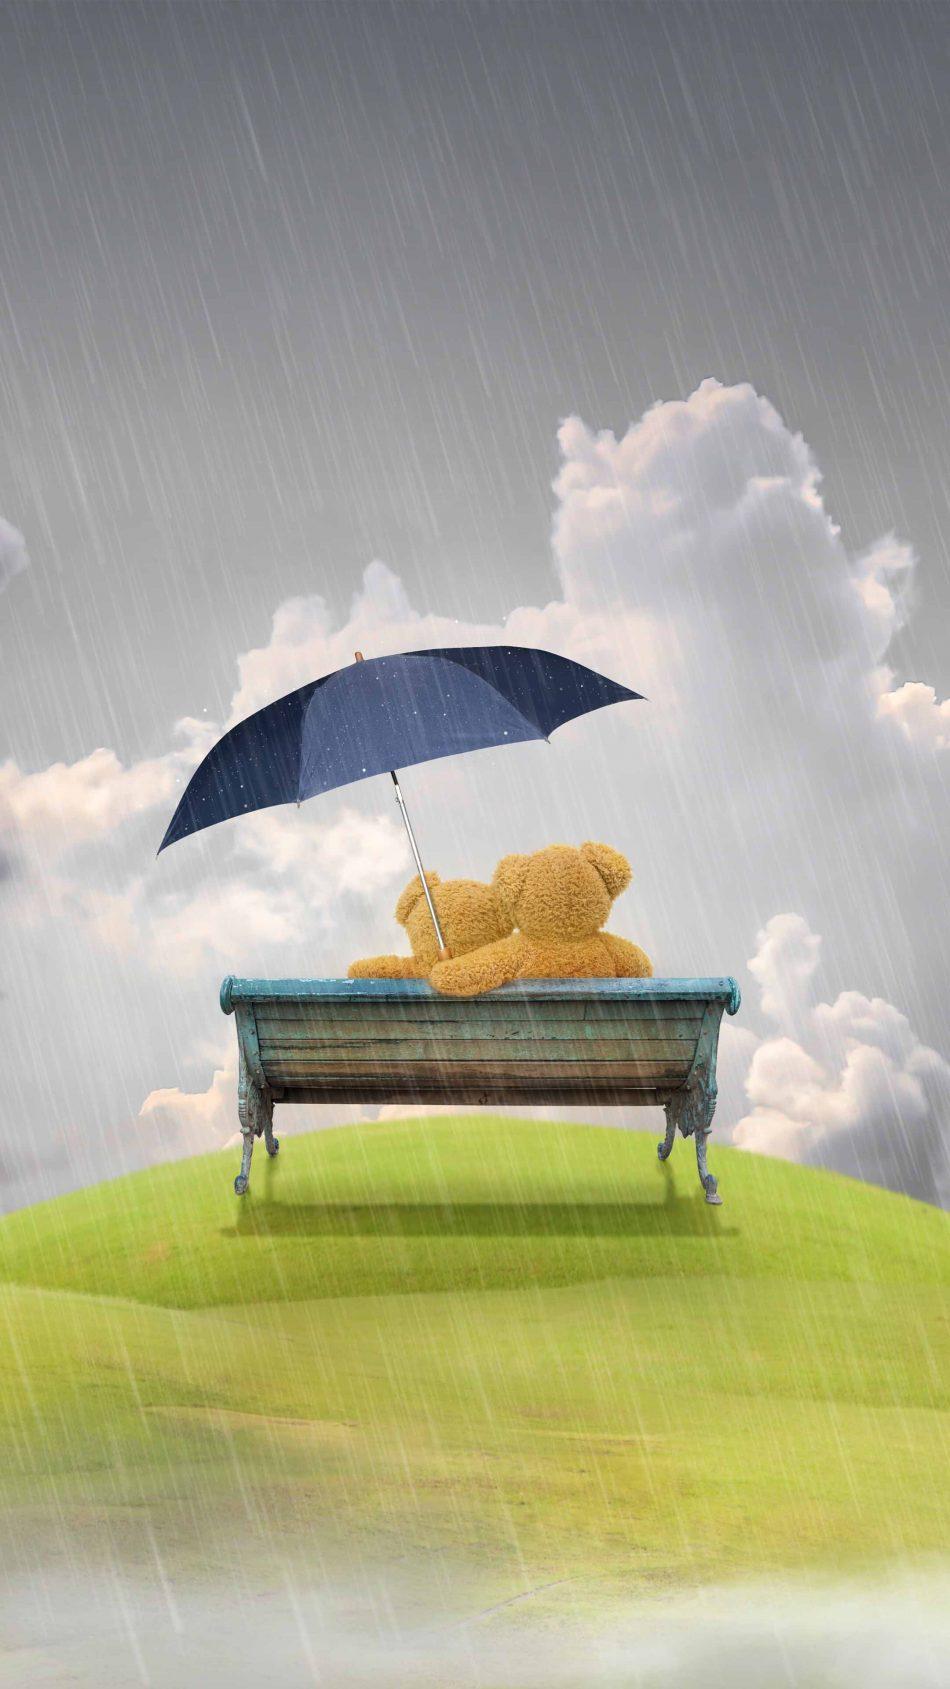 Teddy Bears Couple Rain Umbrella Valentine's Day 4K Ultra HD Mobile Wallpaper